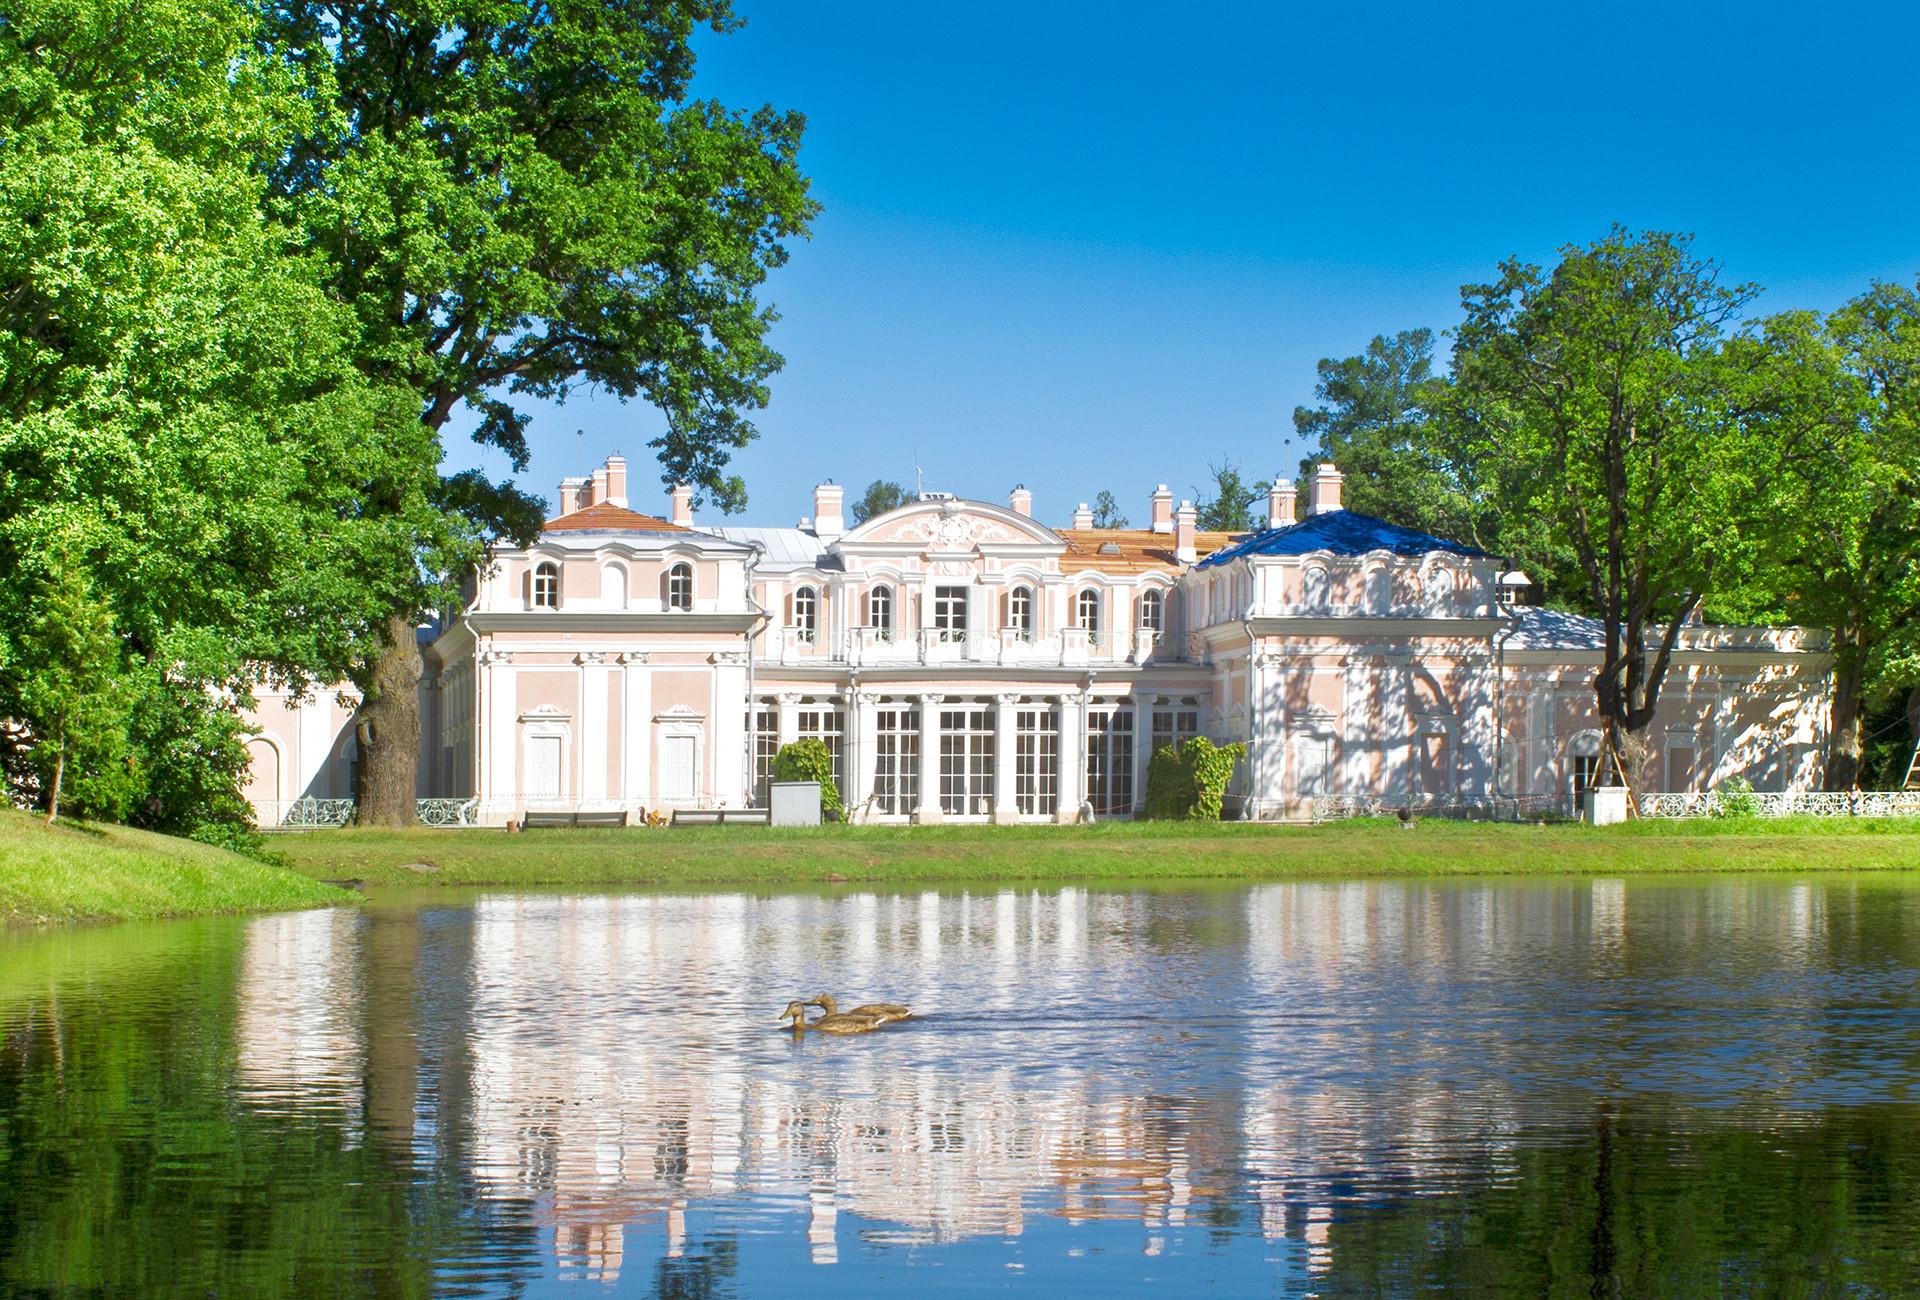 Chinese Palace in Oranienbaum